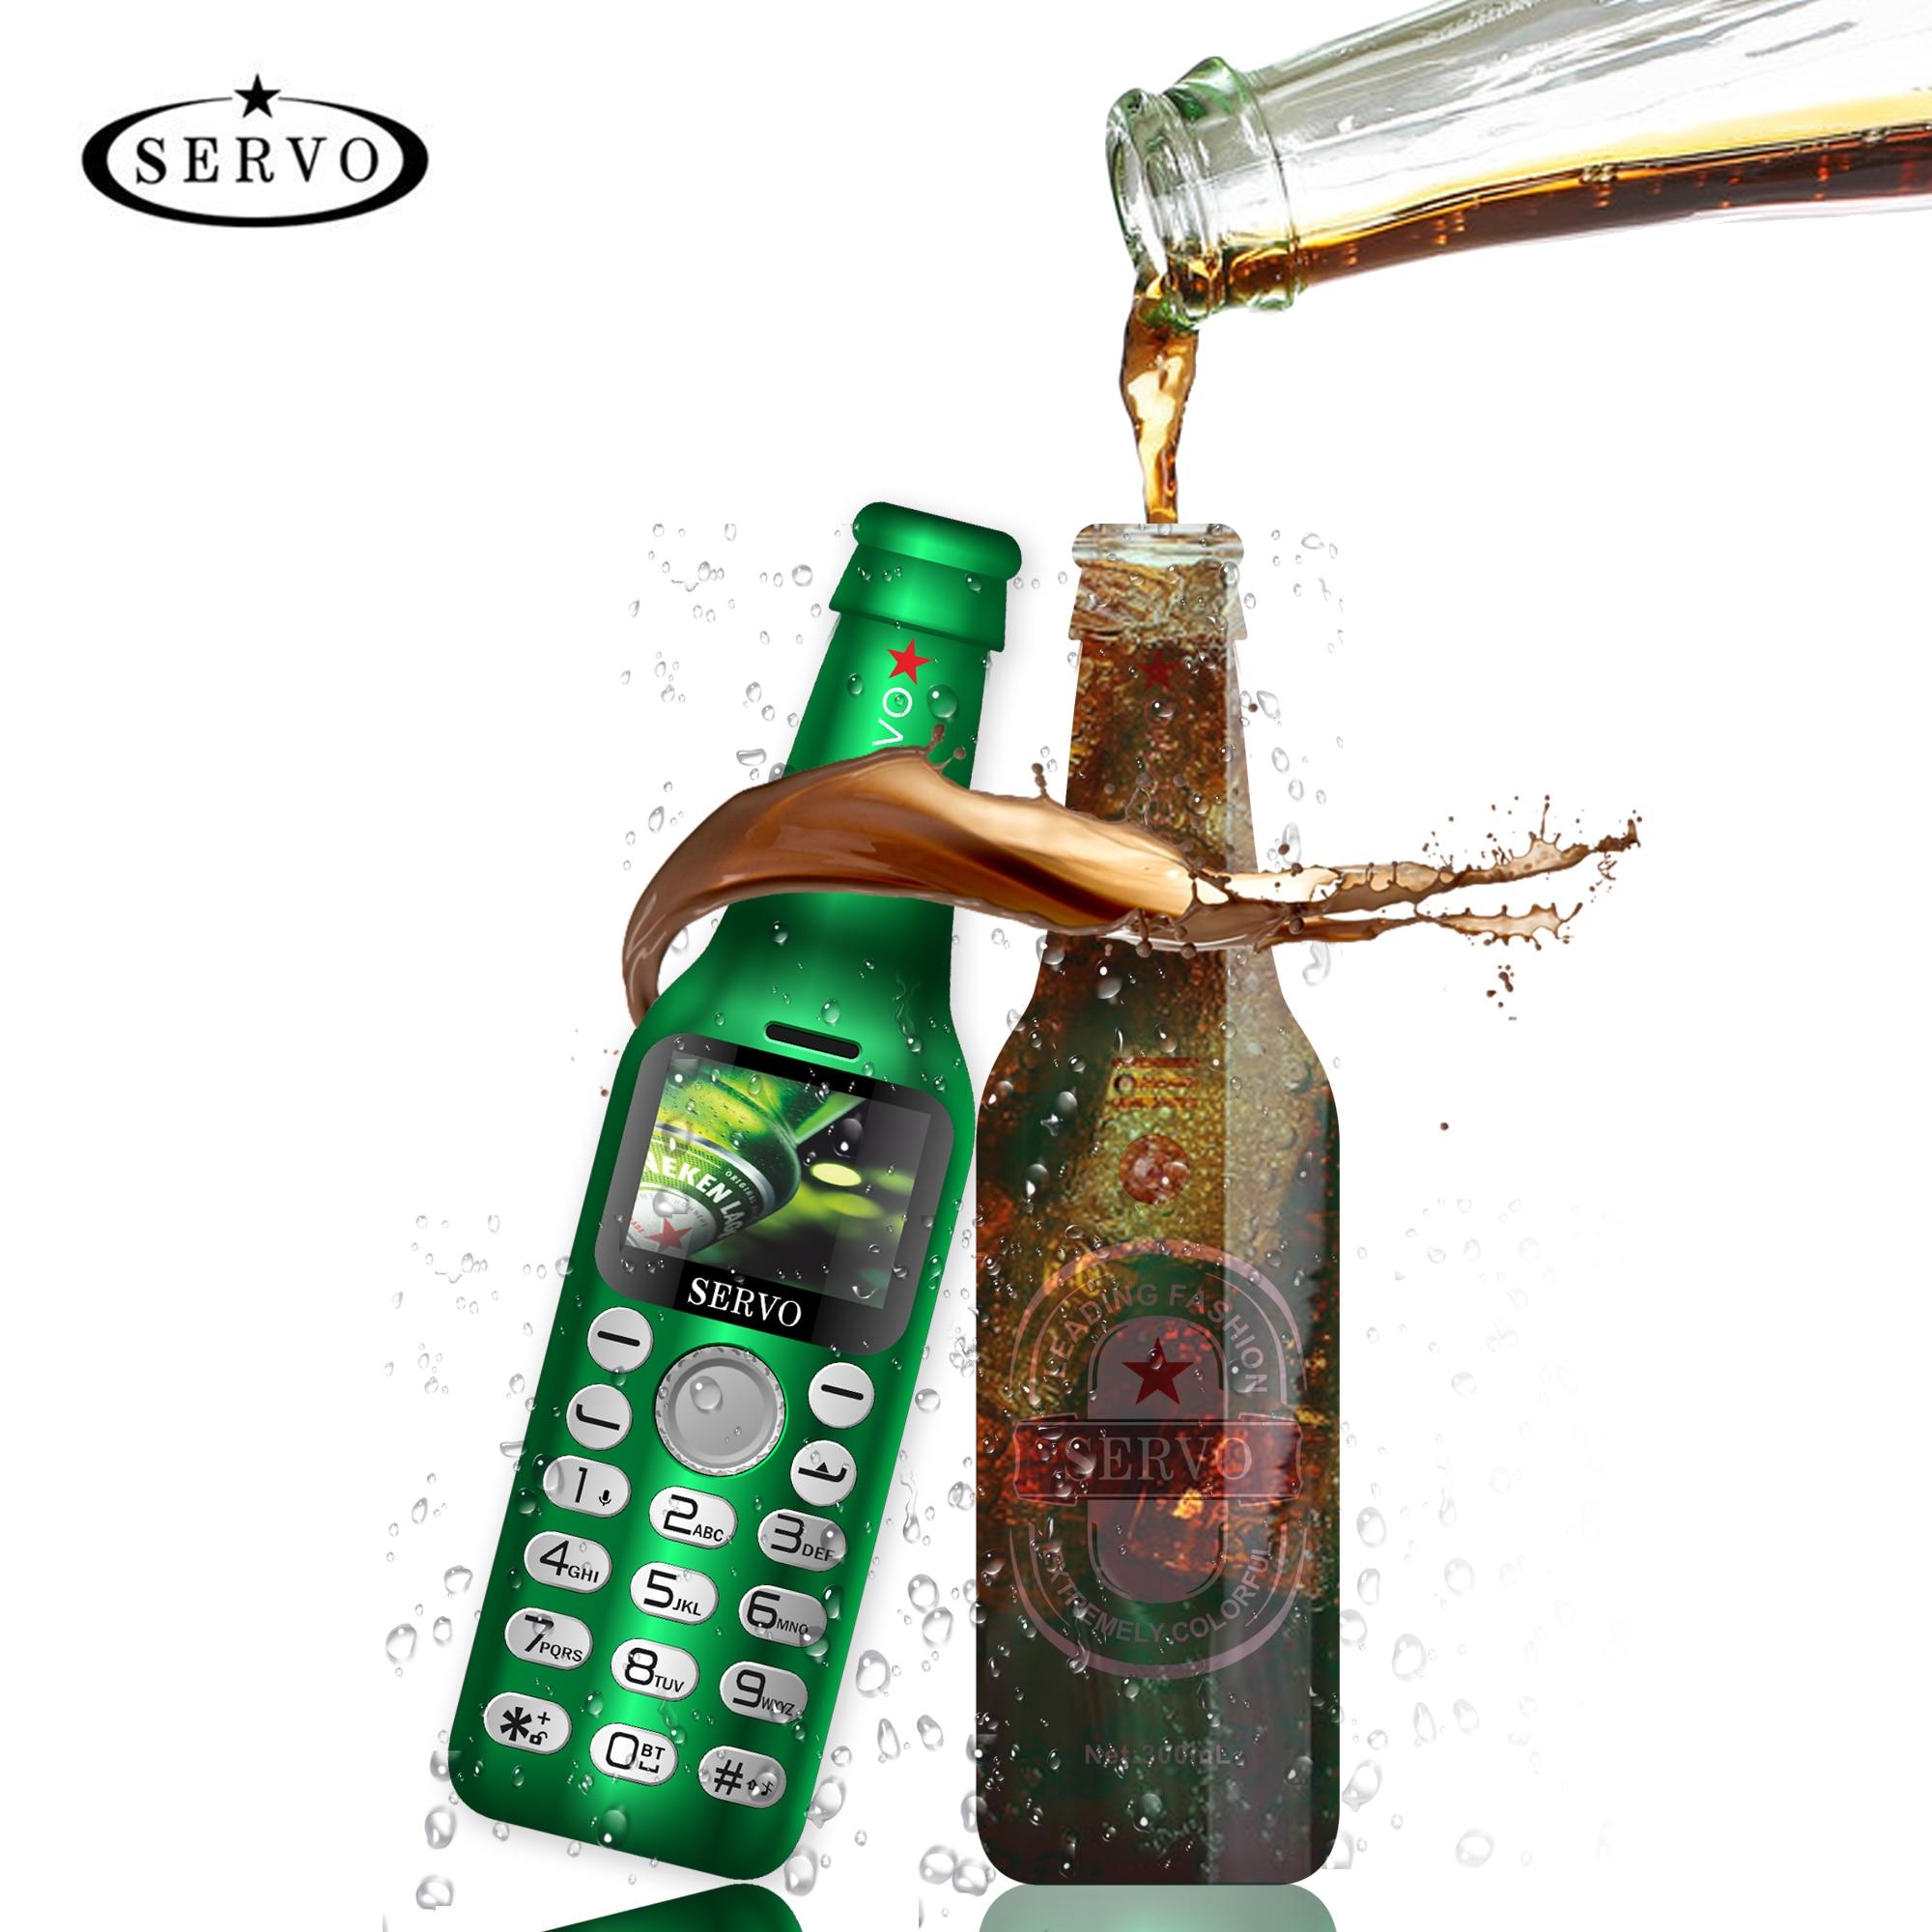 SERVO-هاتف ذكي صغير بمفتاح واحد ، هاتف ذكي صغير V8 ، مع زجاجة نبيذ ، اتصال bluetooth ، HD ، صوت سحري ، مسجل بمفتاح واحد ، لغة روسية